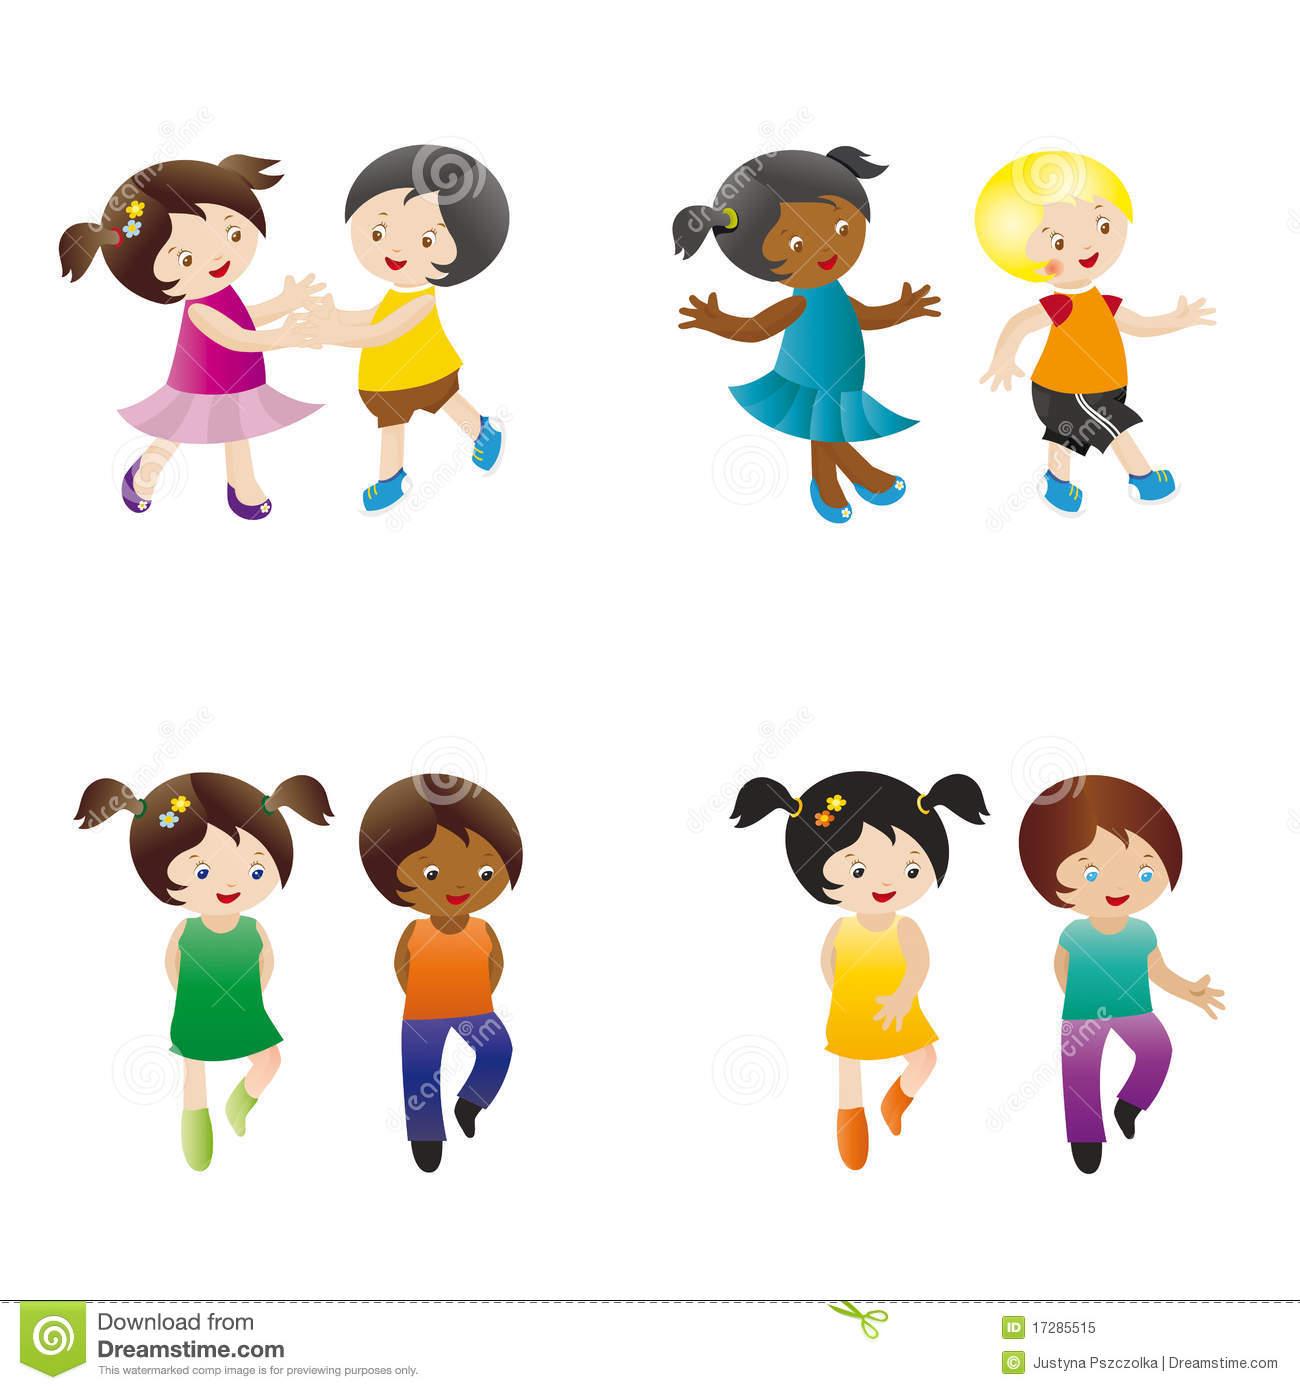 Dancing kids - Kids Dancing Clipart